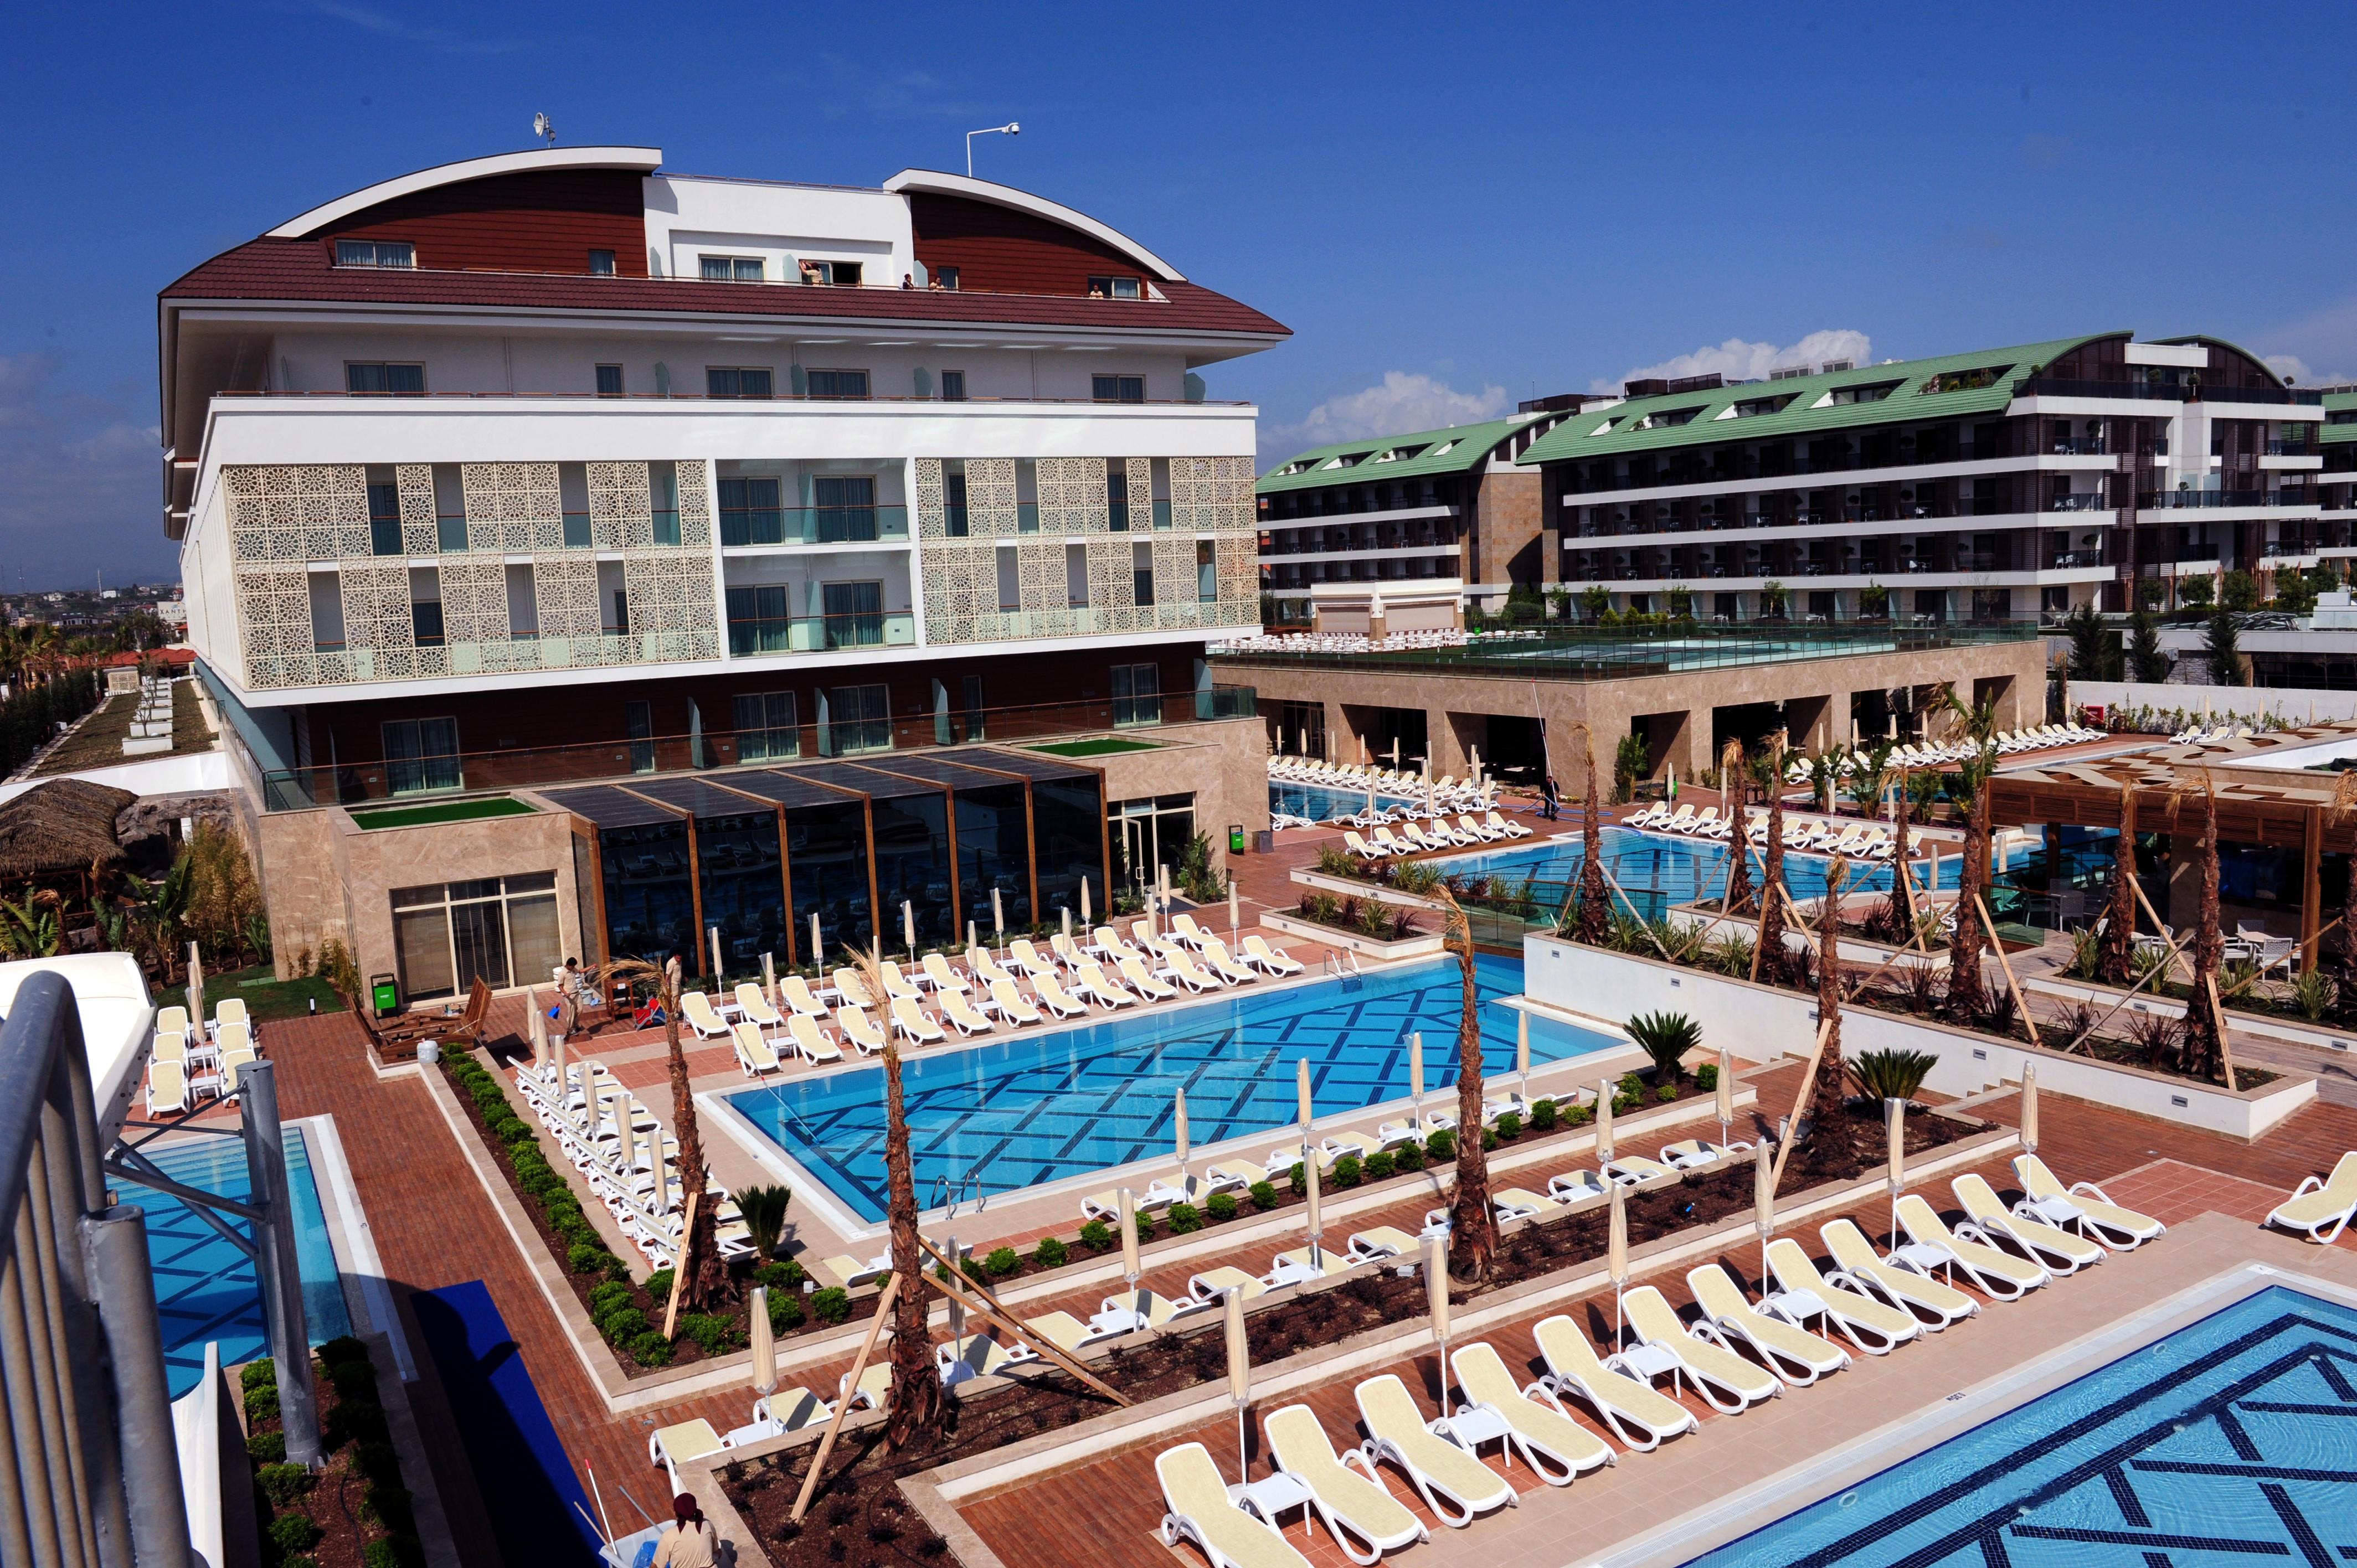 Trendy verbena beach hotel in evrenseki holidaycheck for Trendy hotel